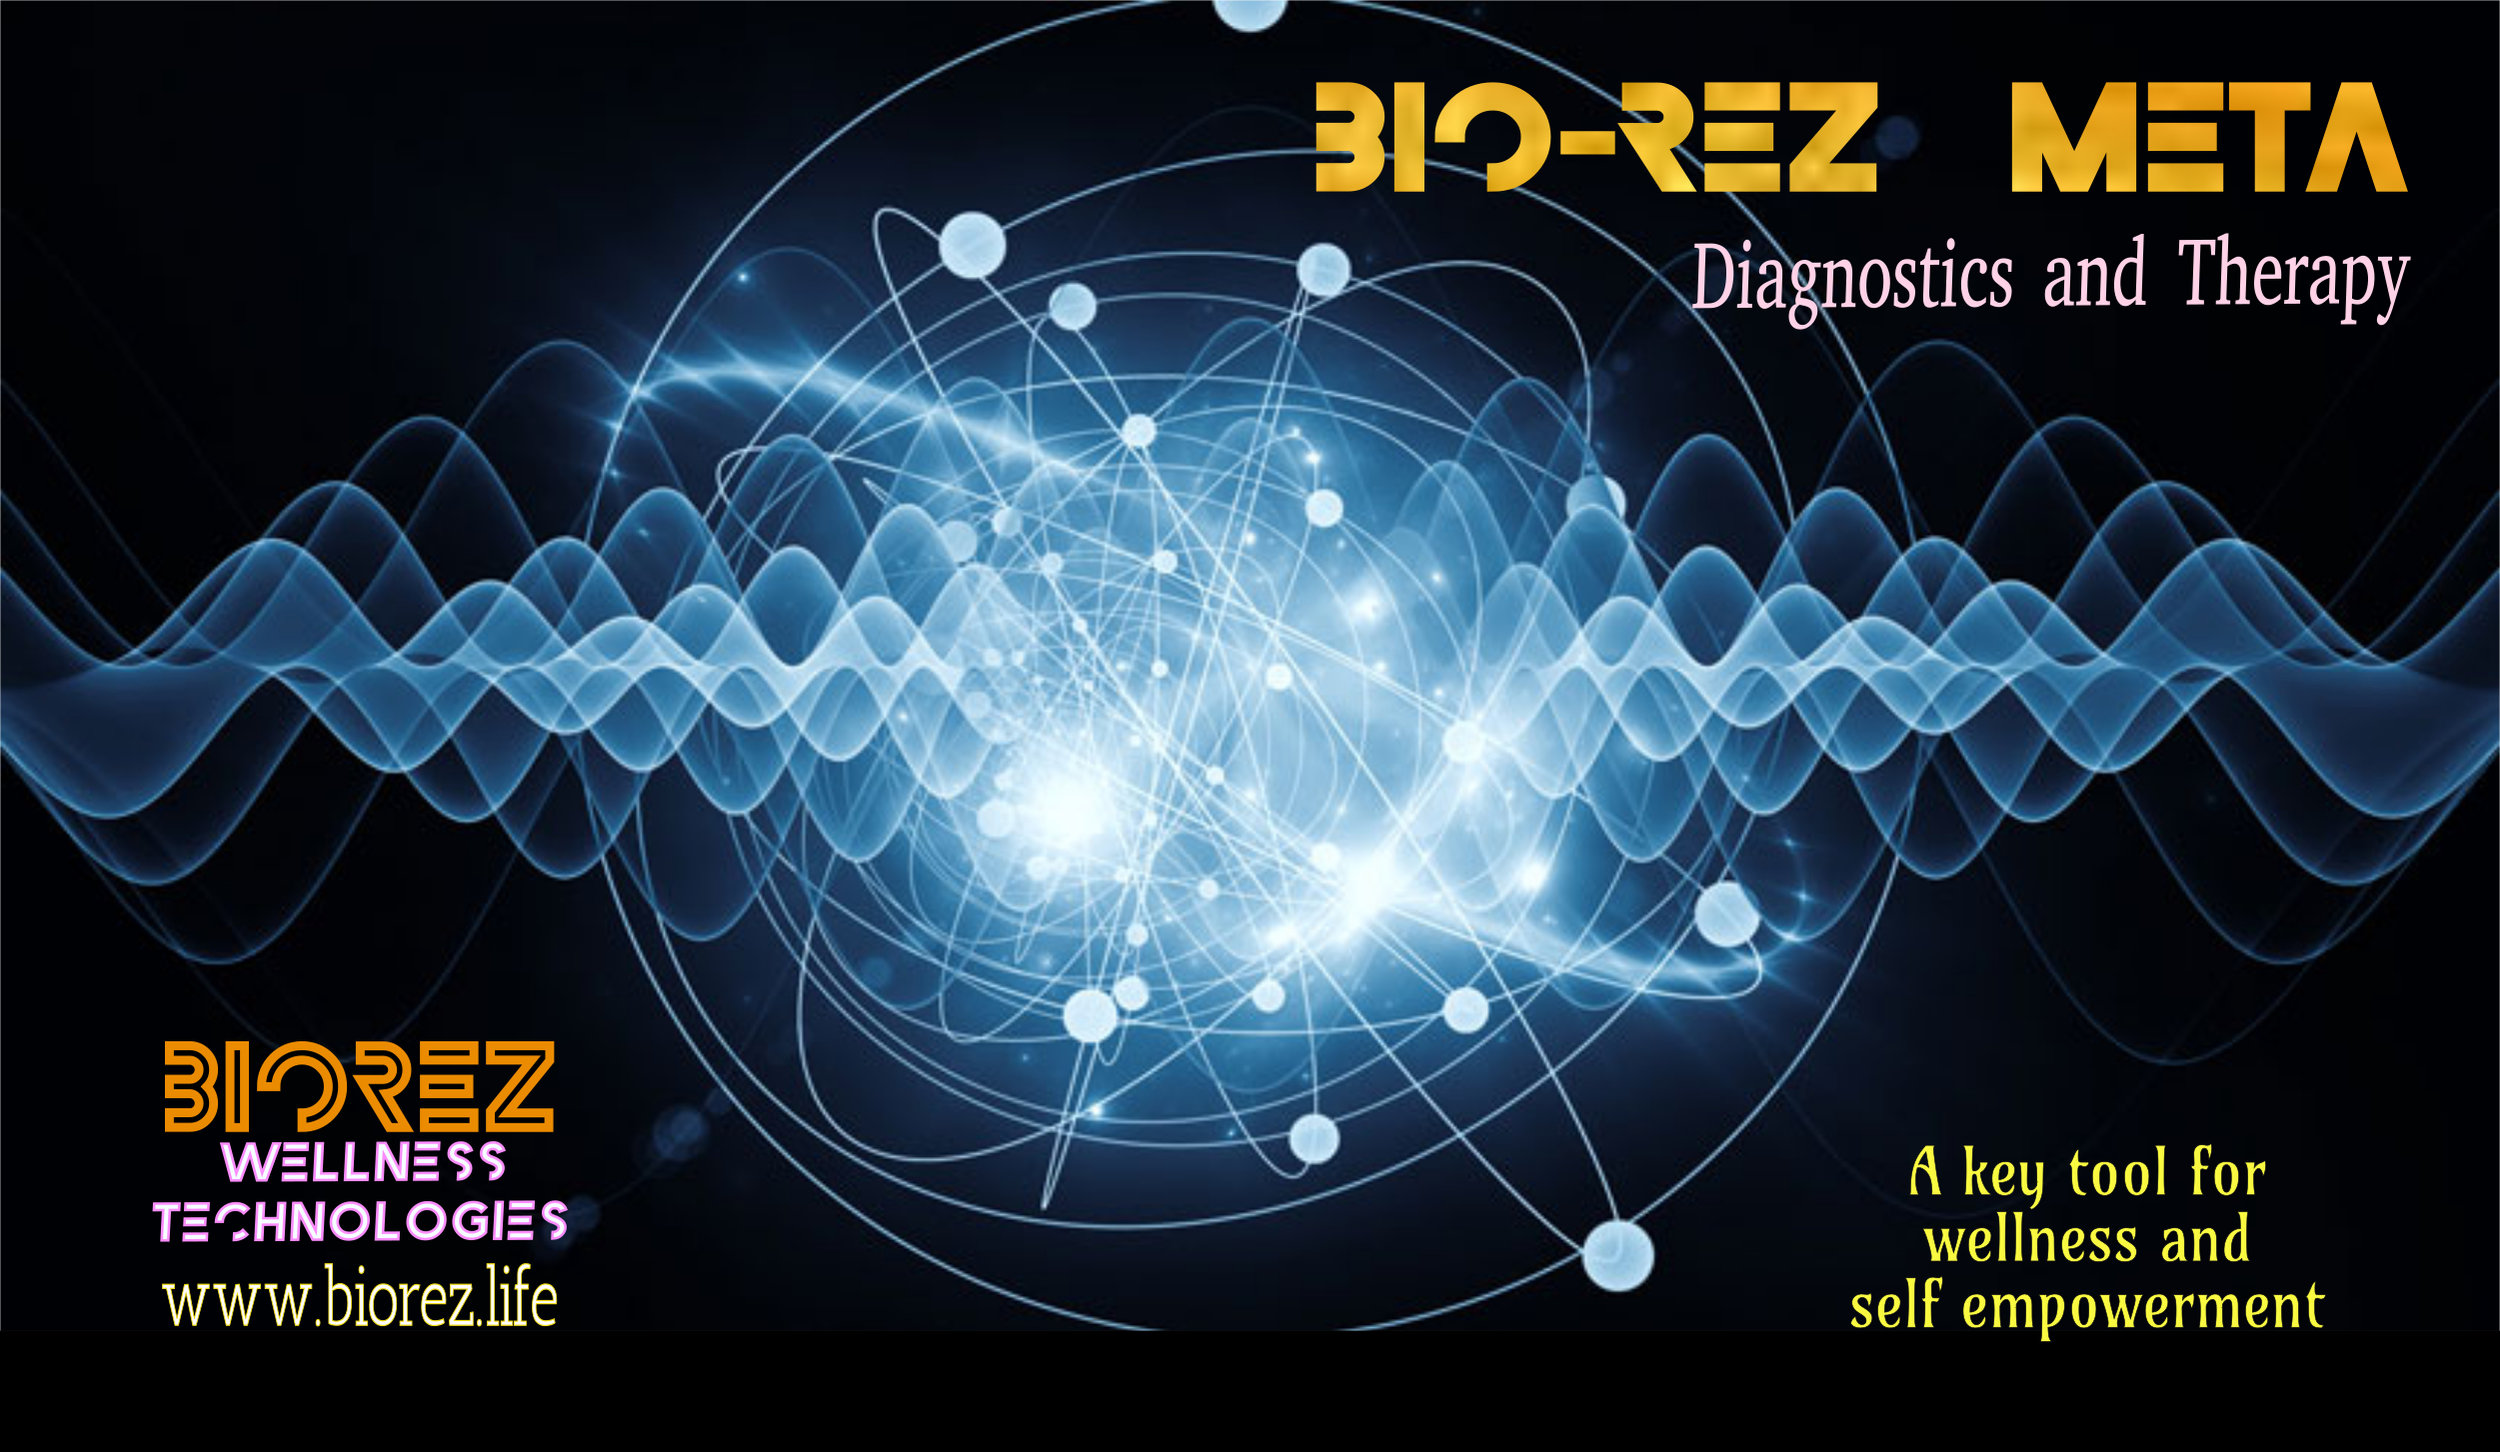 BIOREZ META - An accurate non-invasive diagnostic device proven to be a key tool for wellness and self empowerment.www.biorez.life